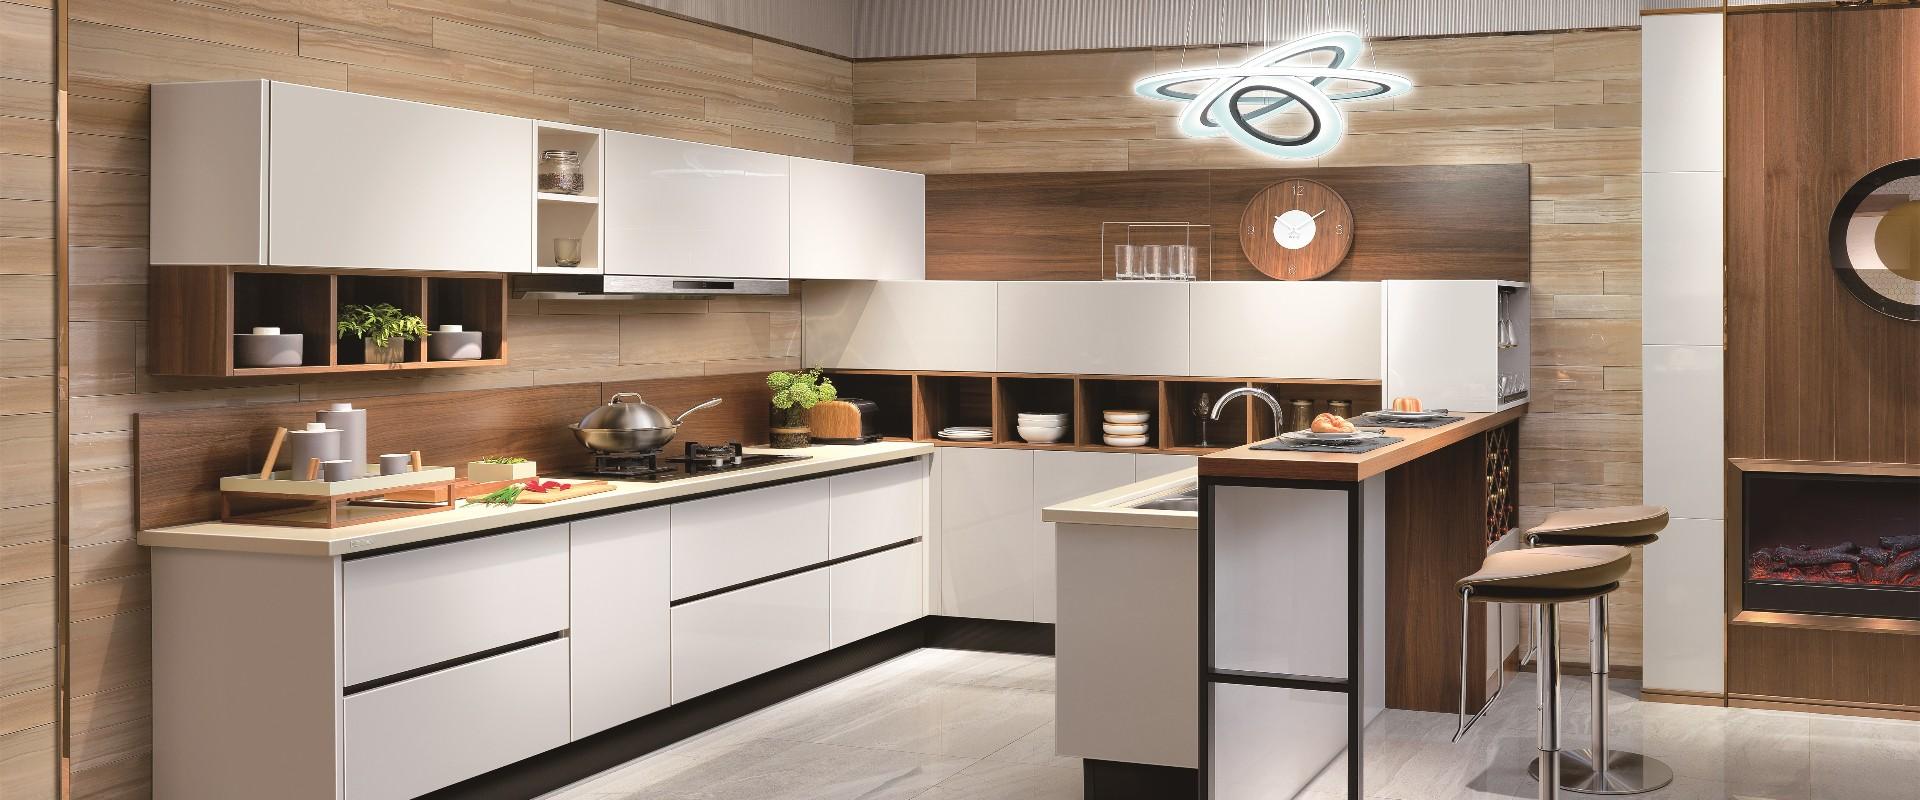 white grace kitchen cabinet deisgn